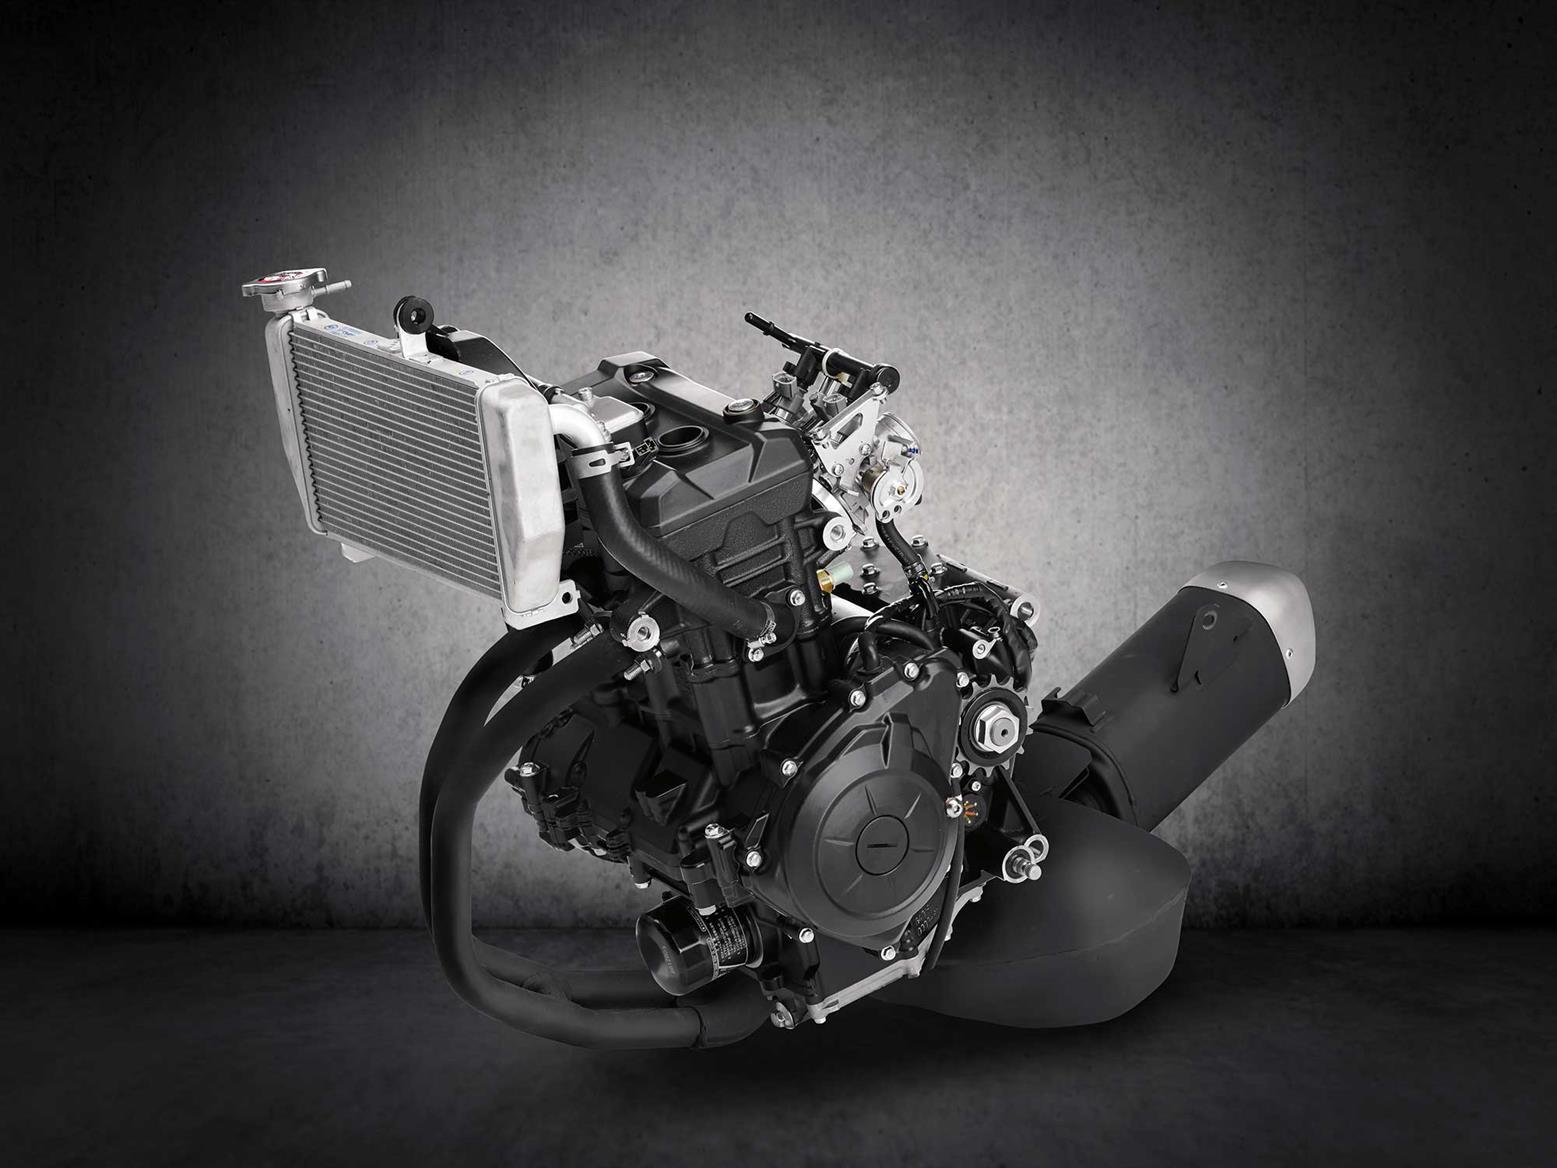 Yamaha R3 engine